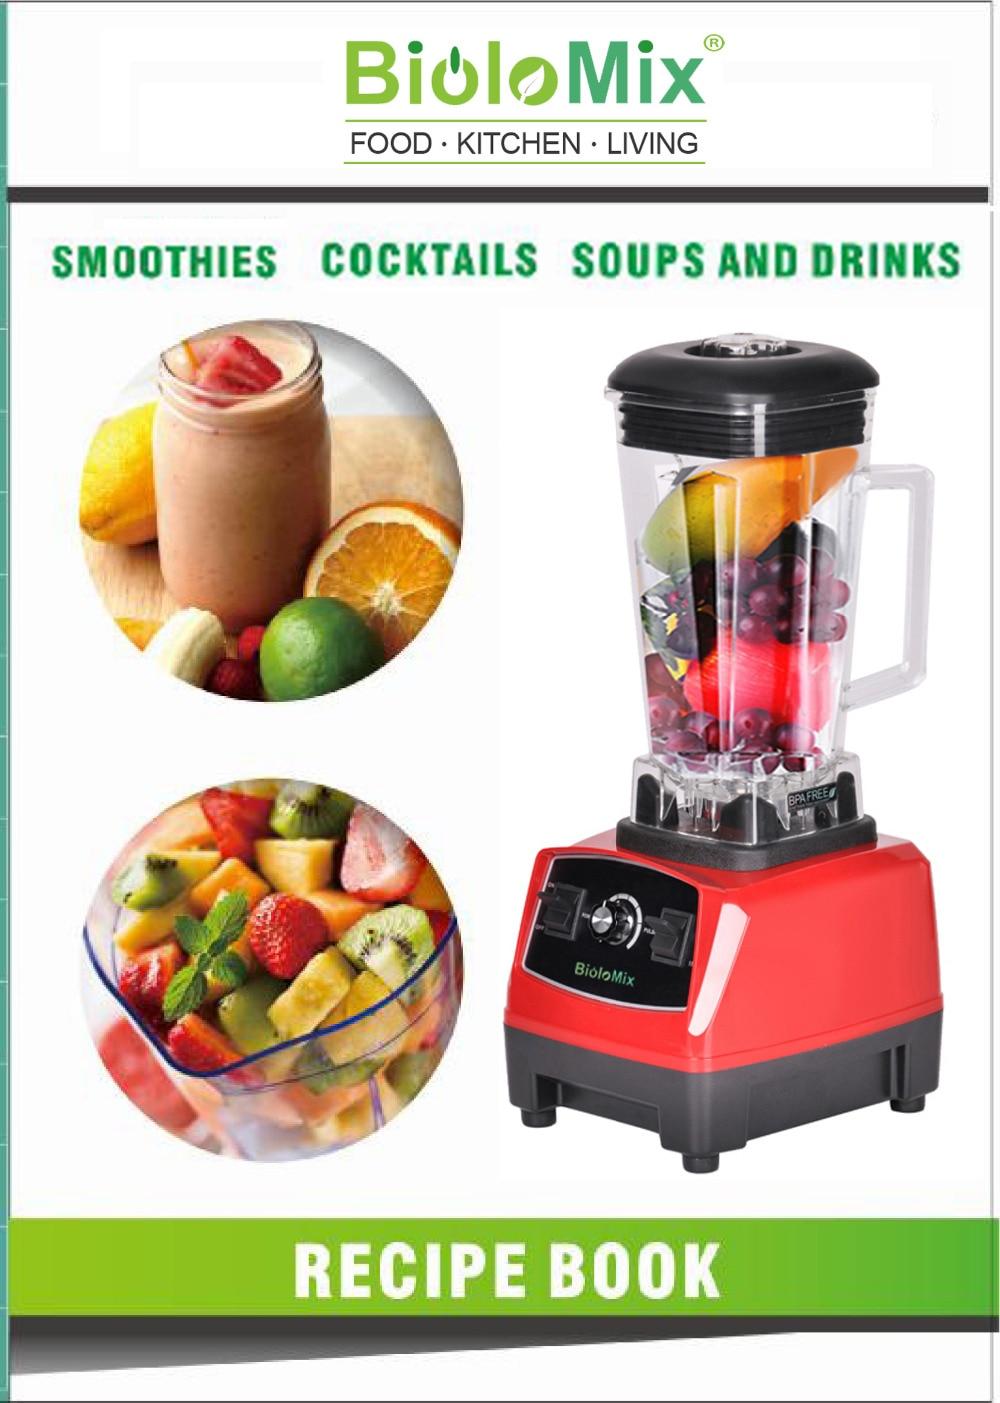 HTB12vXsmYsrBKNjSZFpq6AXhFXa3 Biolomix 2200W 2L BPA FREE commercial grade home professional smoothies power blender food mixer juicer food fruit processor